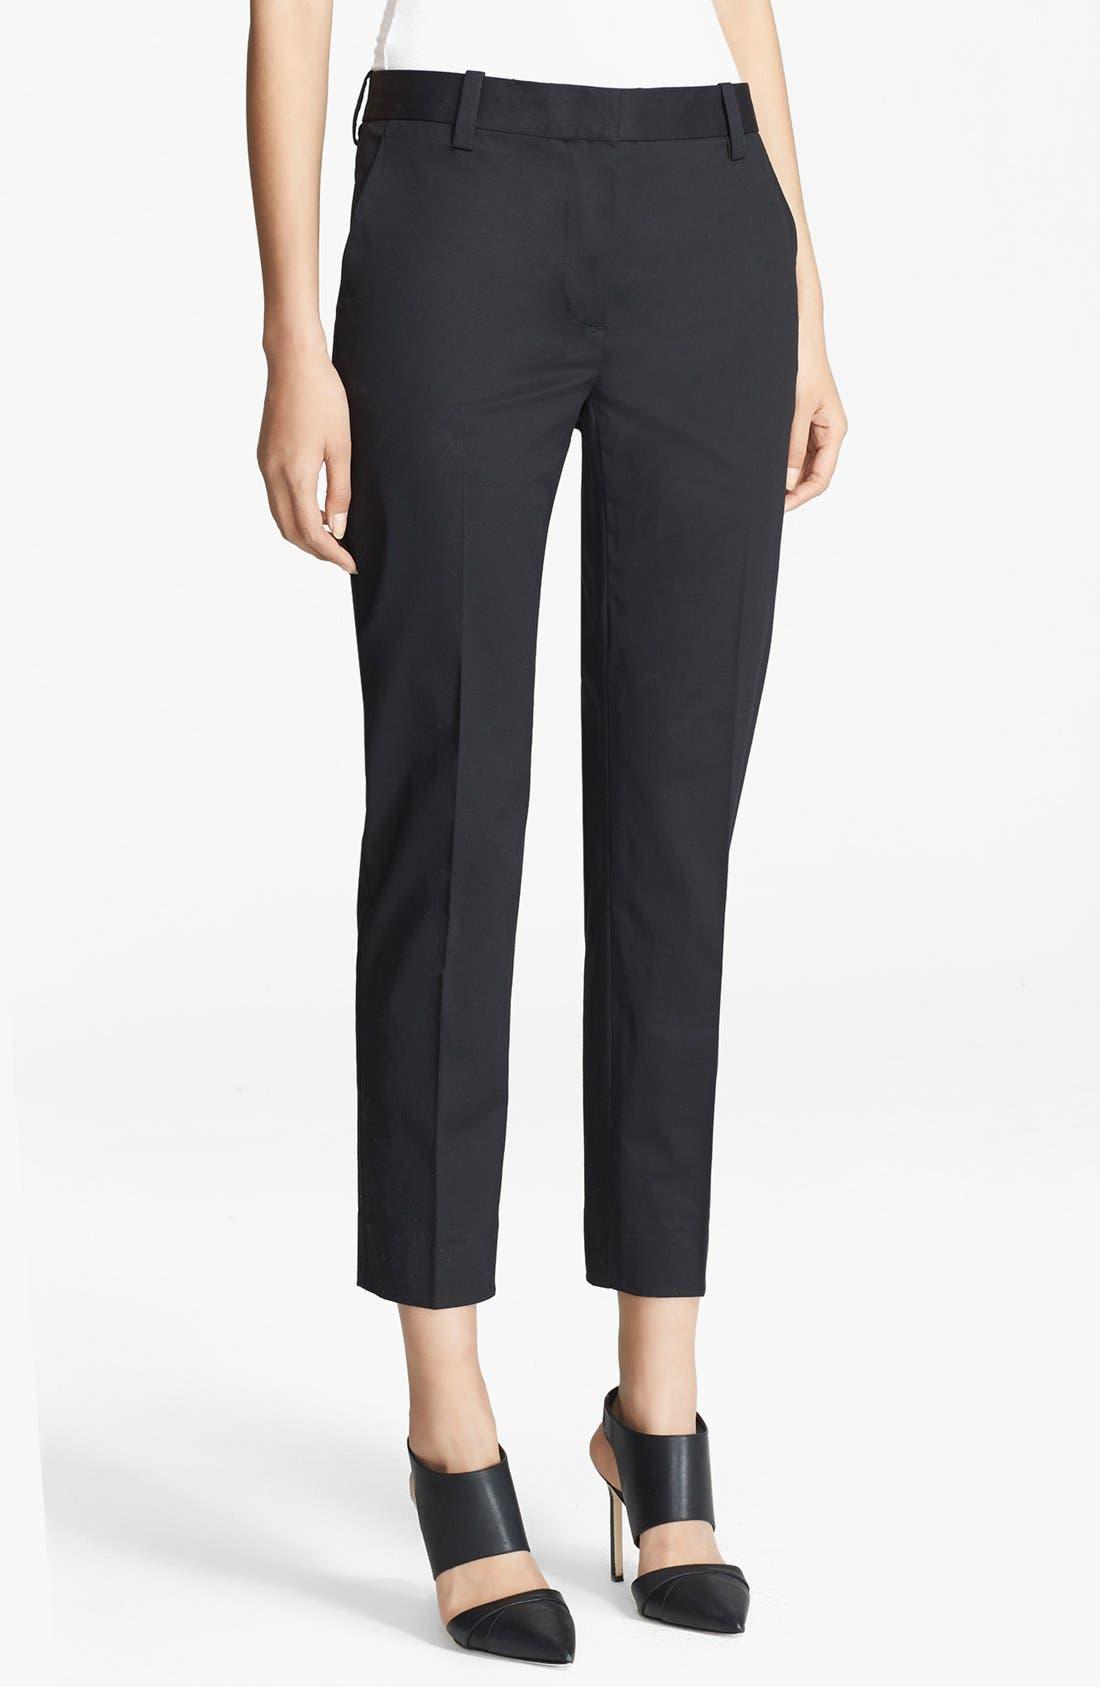 Alternate Image 1 Selected - 3.1 Phillip Lim Crop Stretch Cotton Pencil Trousers